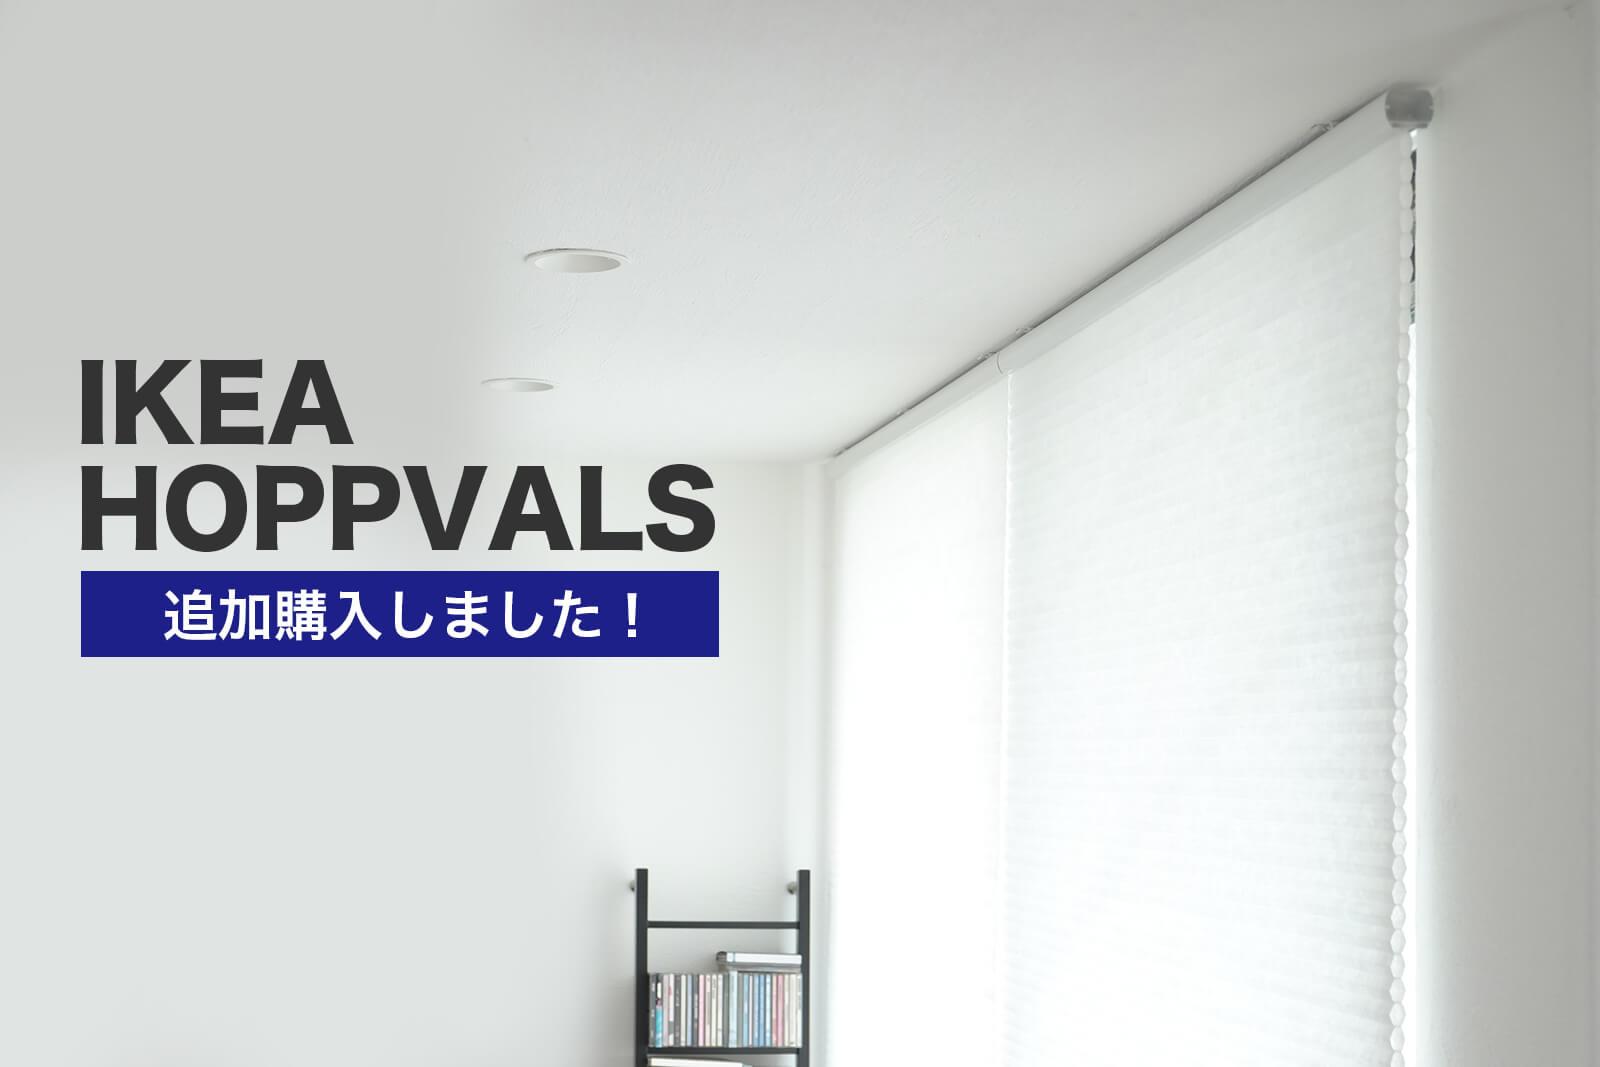 IKEA HOPPVALS追加購入しました